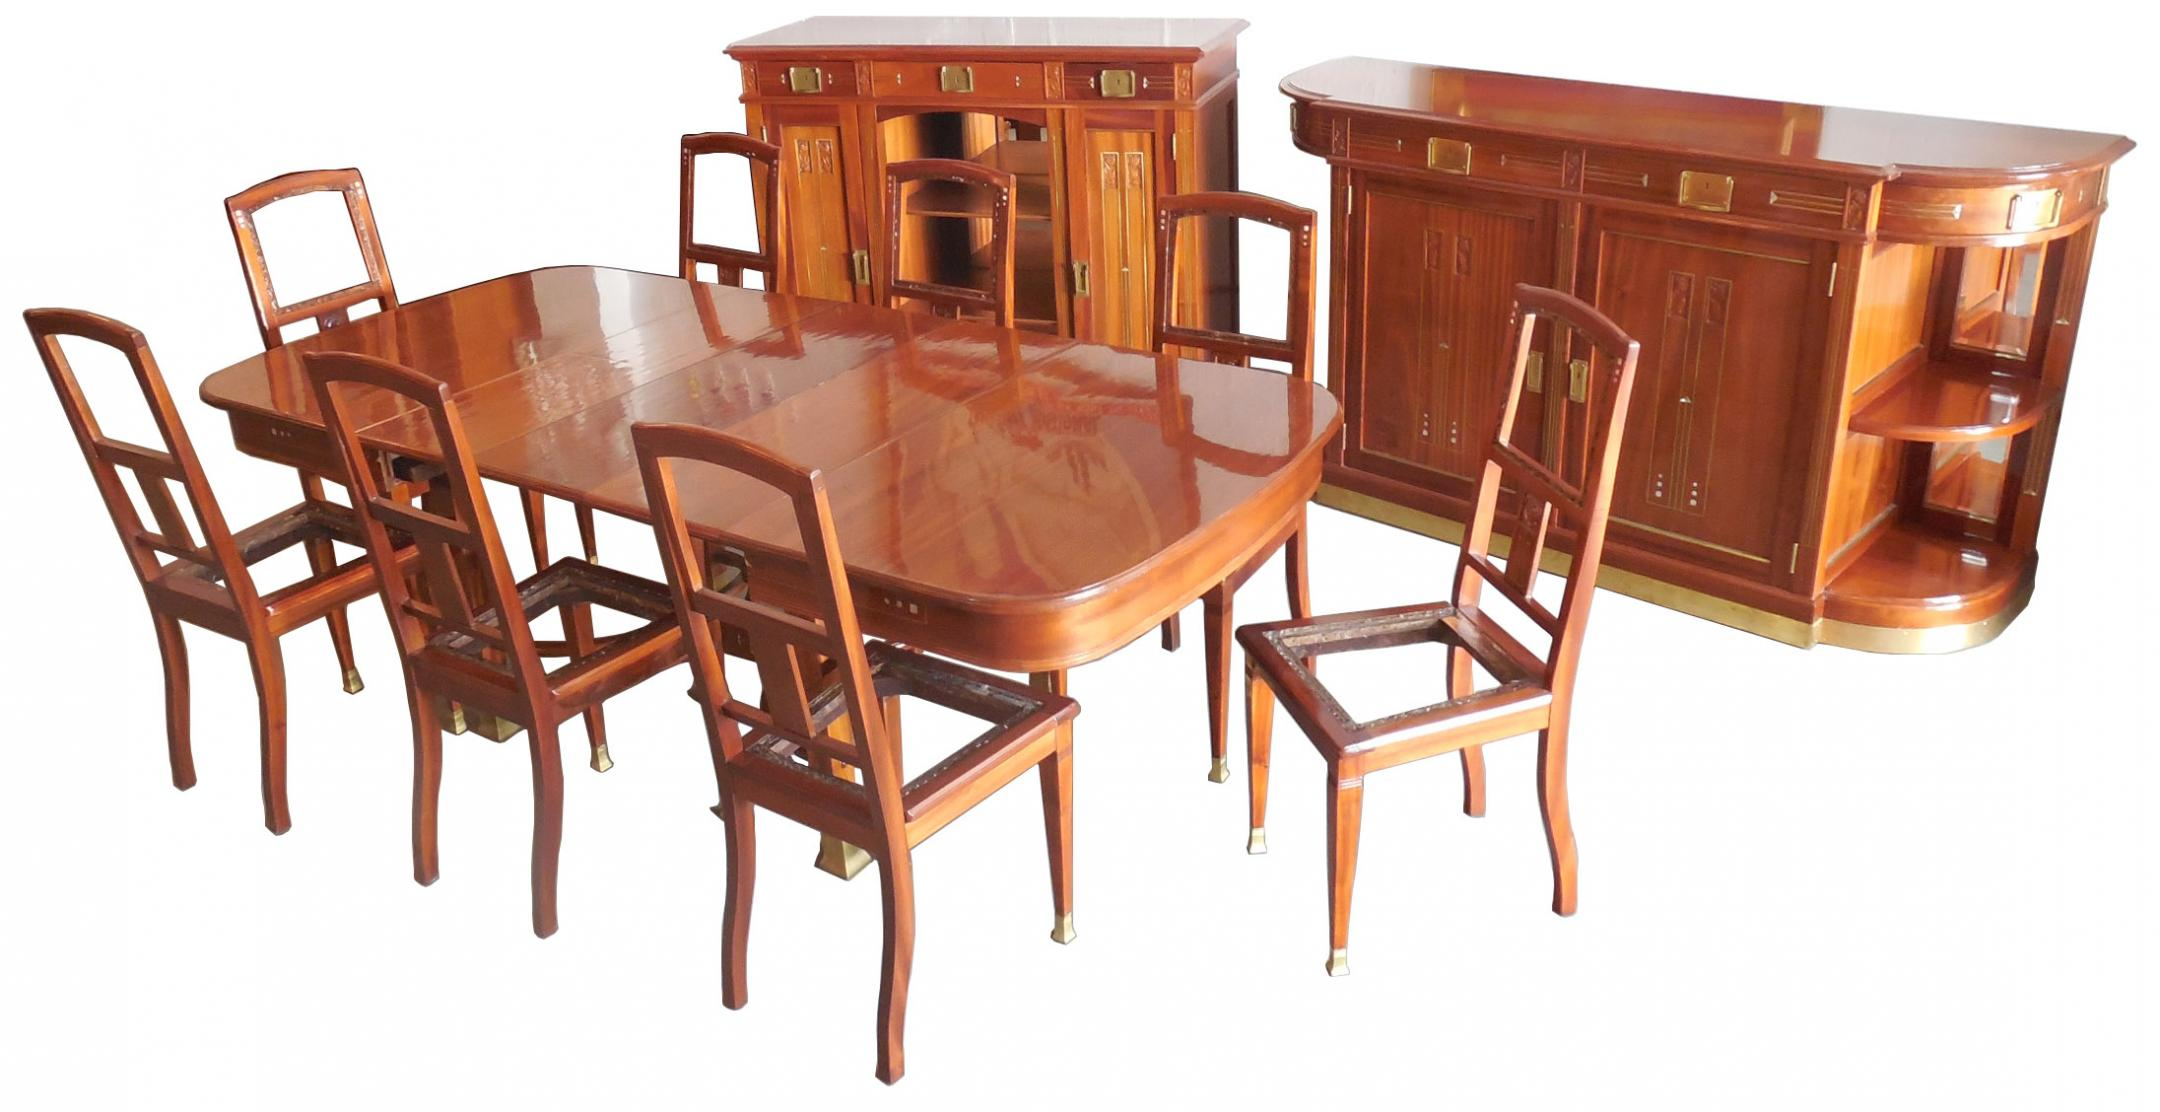 Henry Van De Velde Dining Room Set ART NOUVEAU Modernism